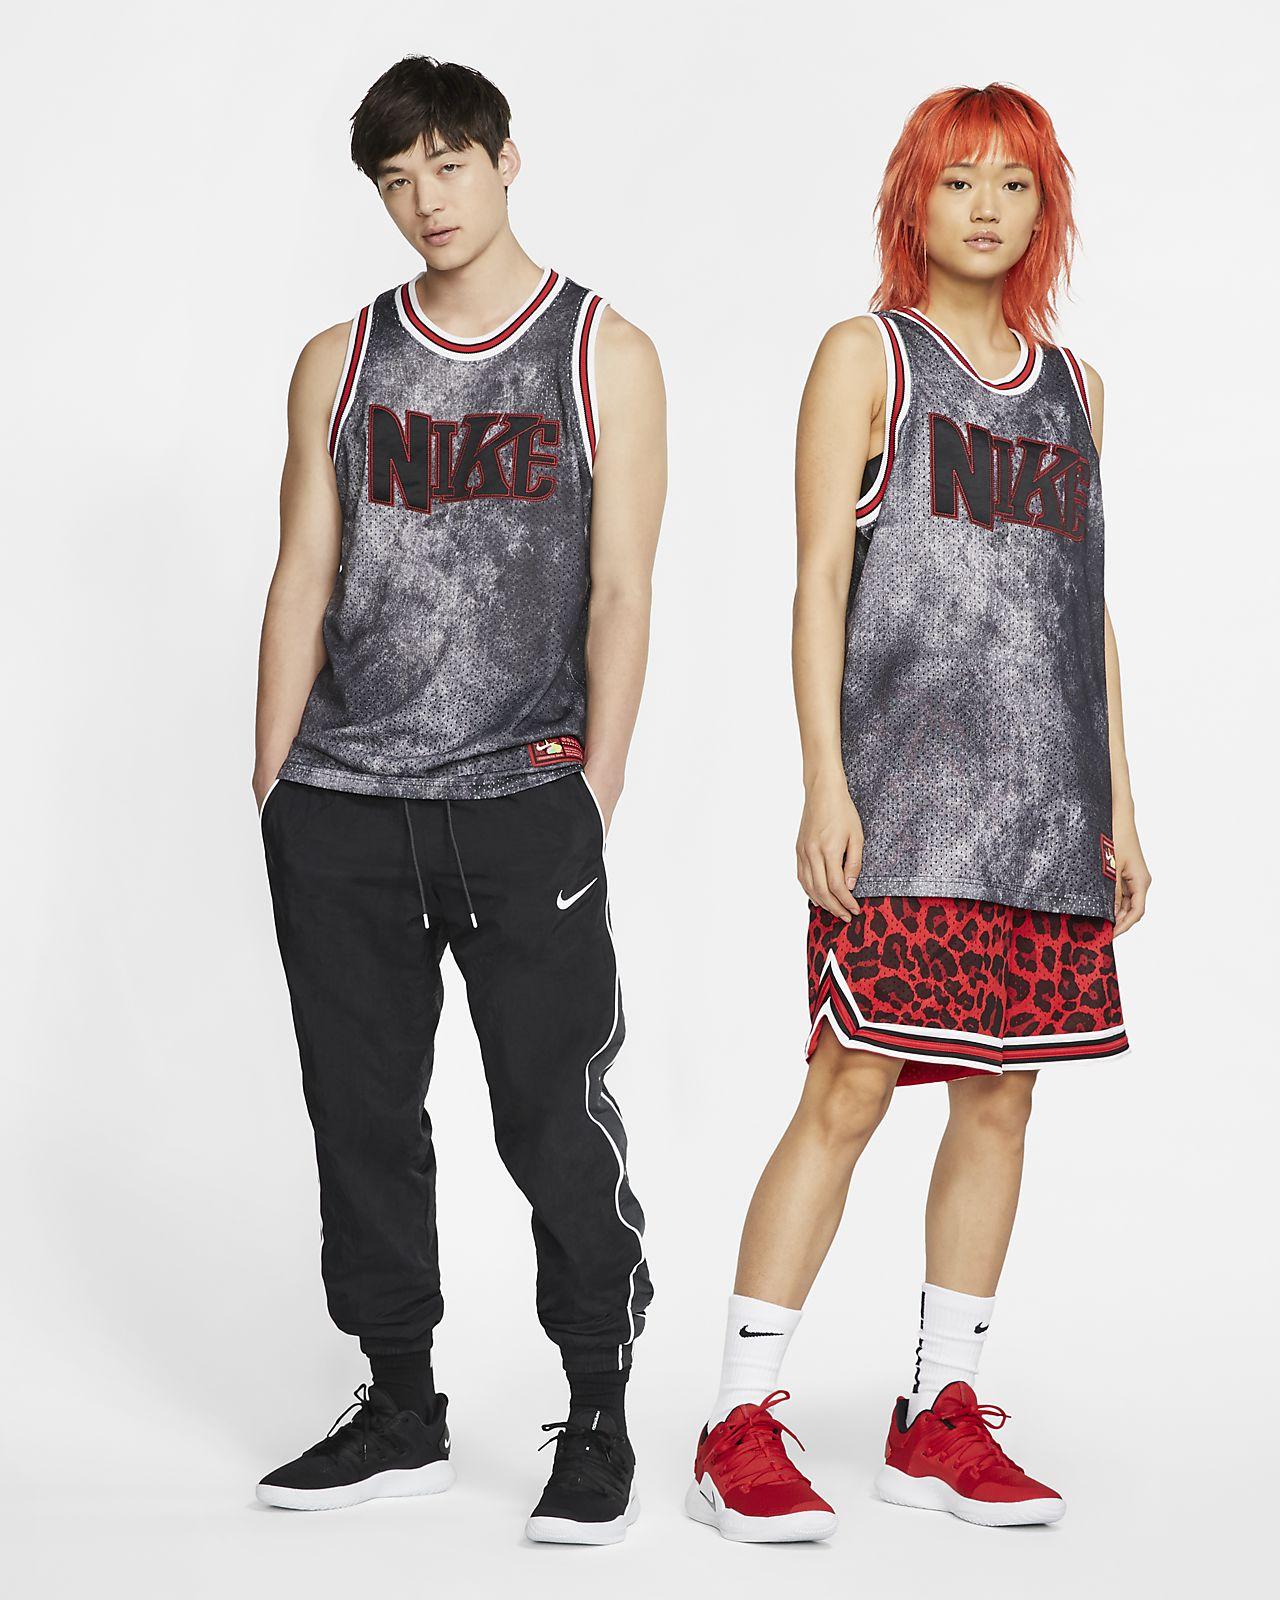 Camisola de basquetebol Nike Dri-FIT DNA